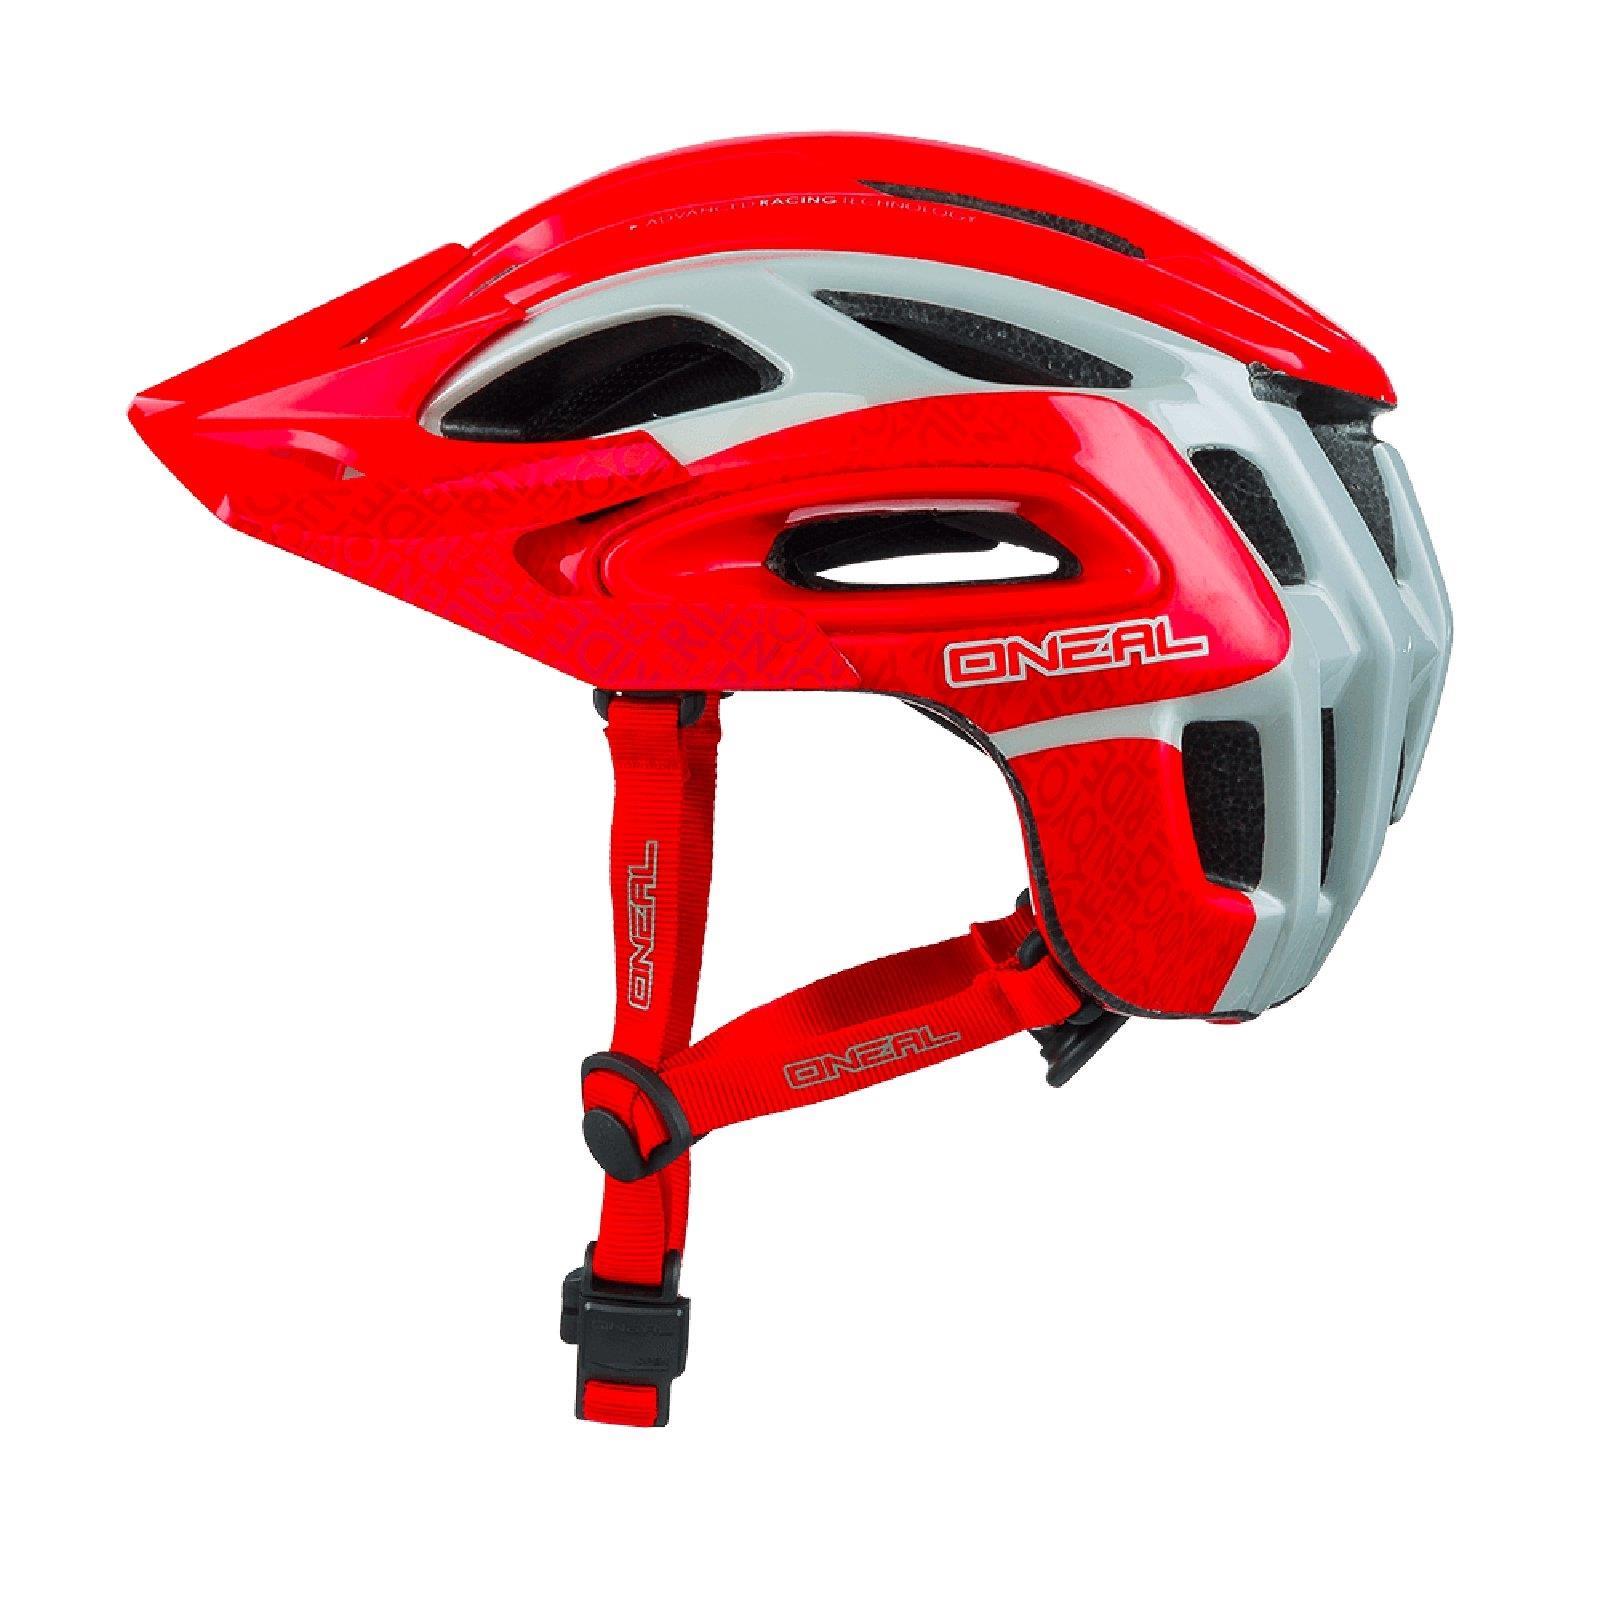 oneal orbiter ii fahrrad helm fidlock freeride fr all. Black Bedroom Furniture Sets. Home Design Ideas